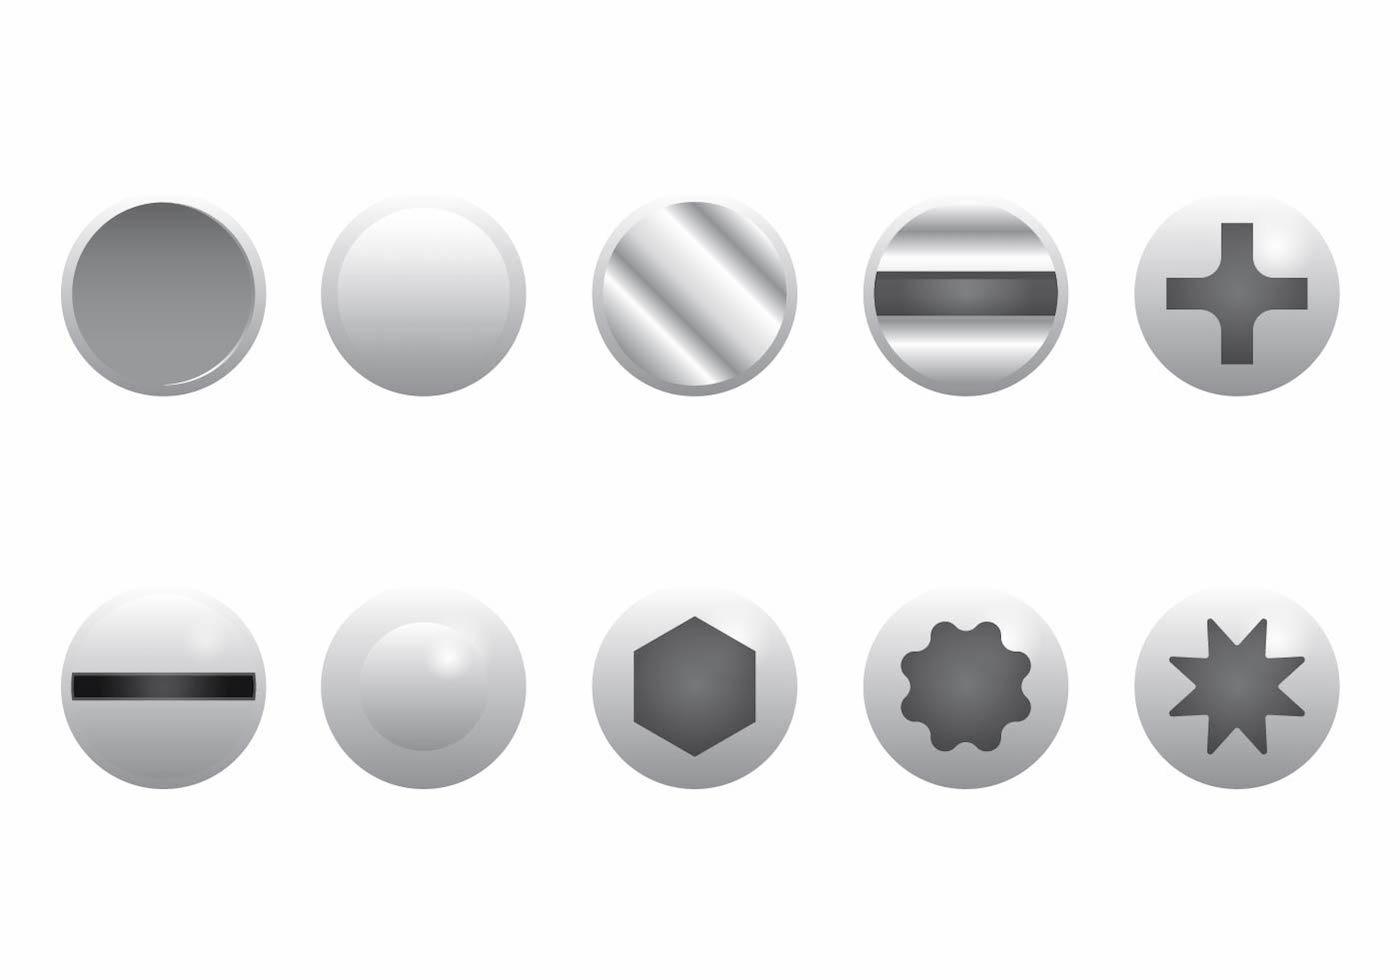 nail head set download free vector art stock graphics